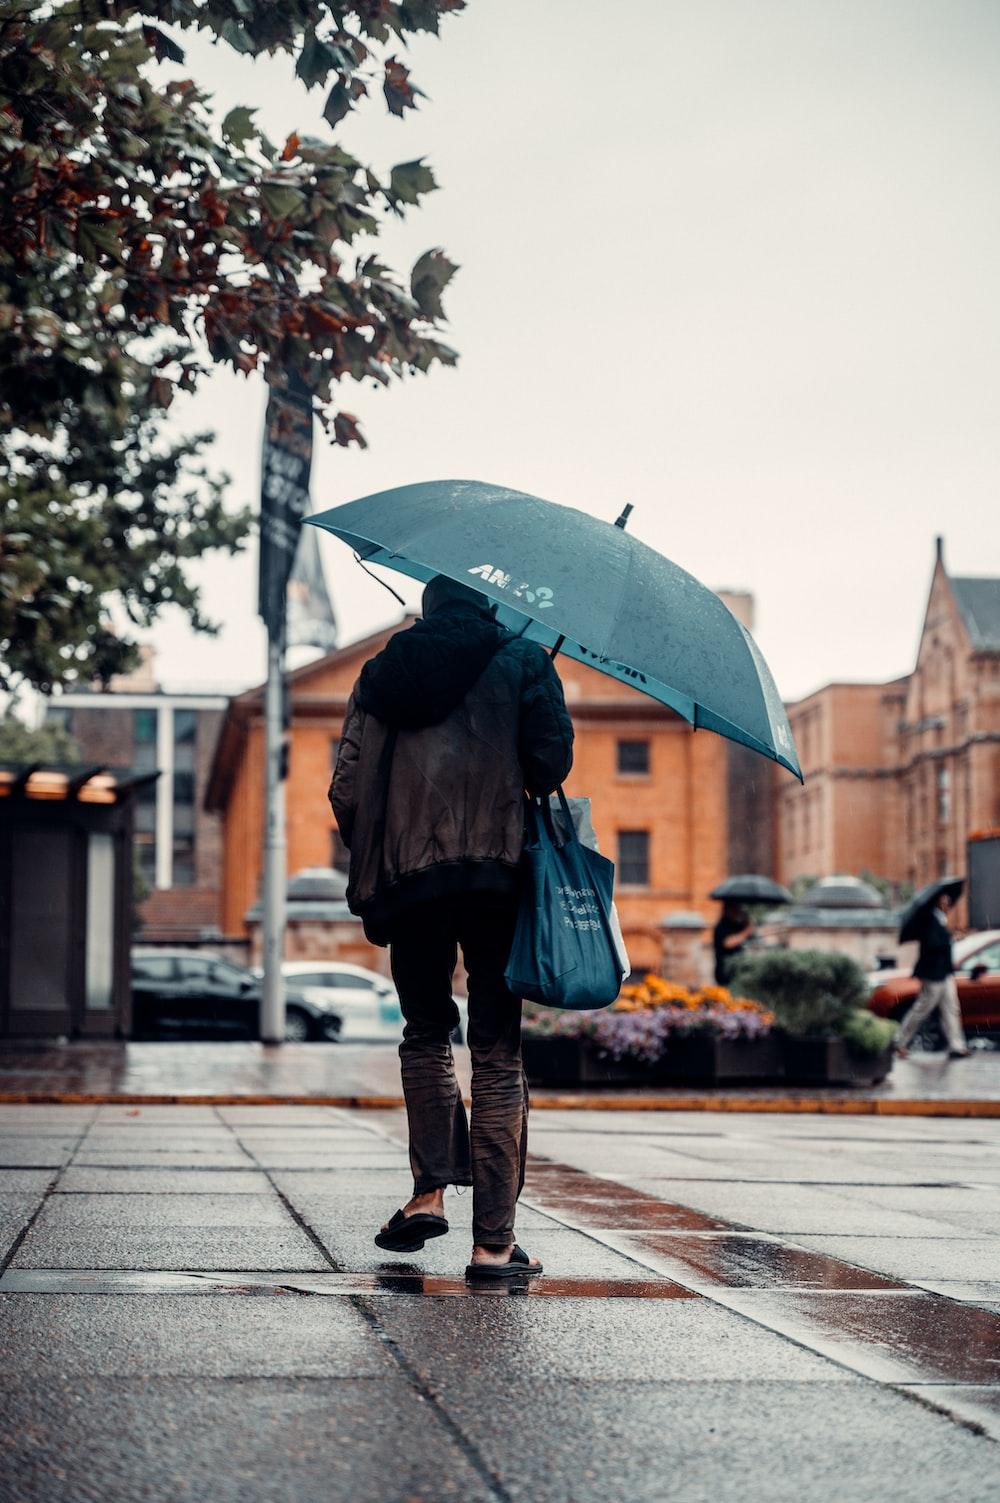 woman in black jacket and blue denim jeans holding umbrella walking on sidewalk during daytime